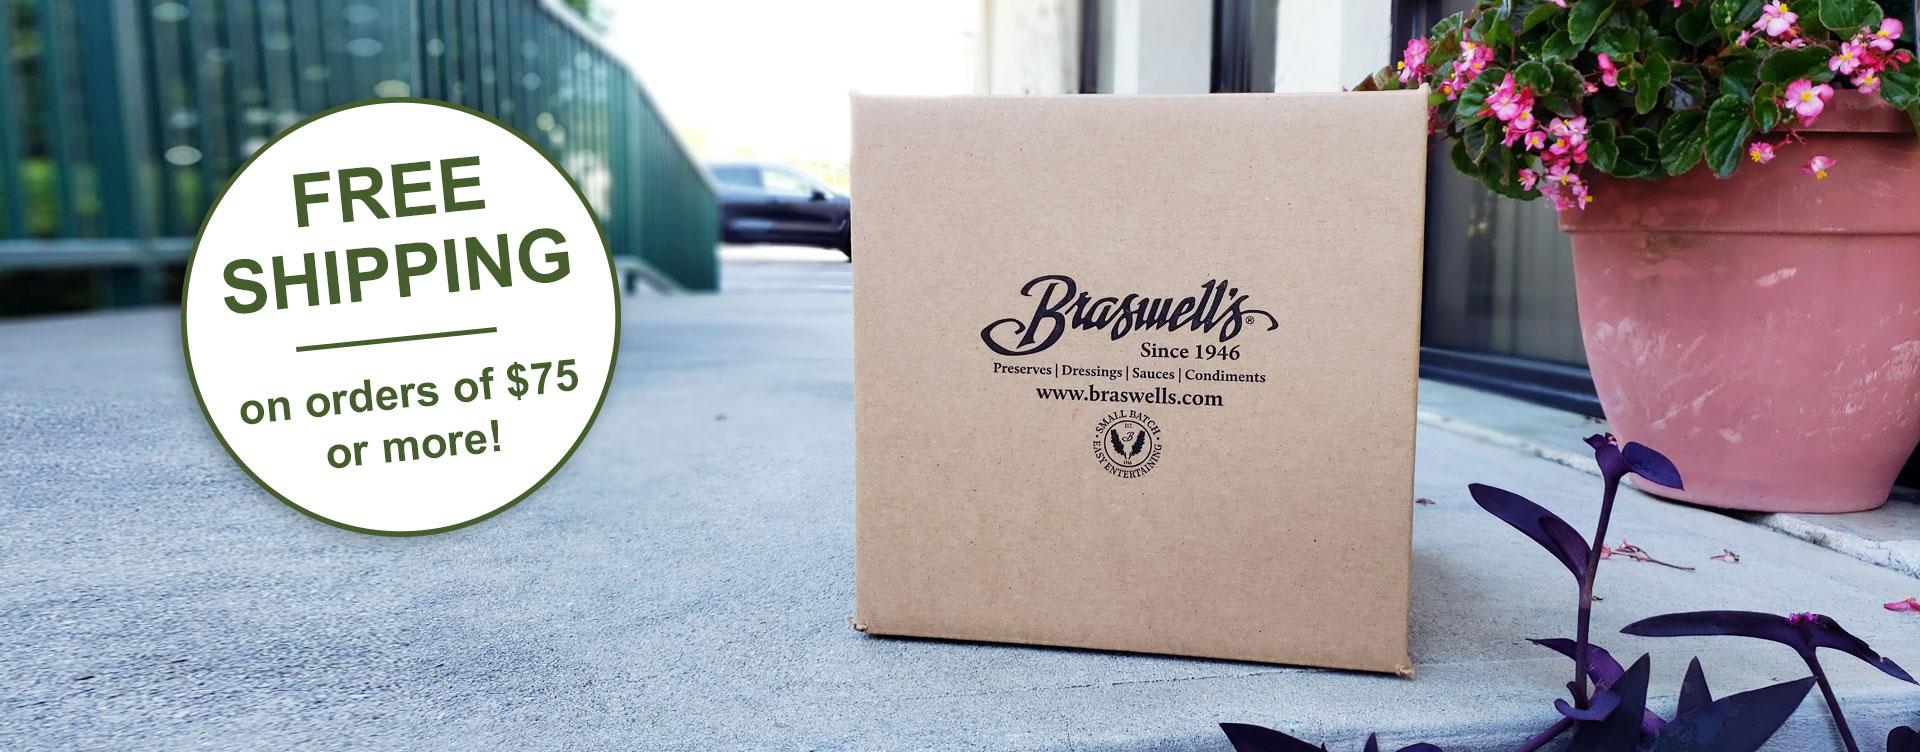 Braswell box